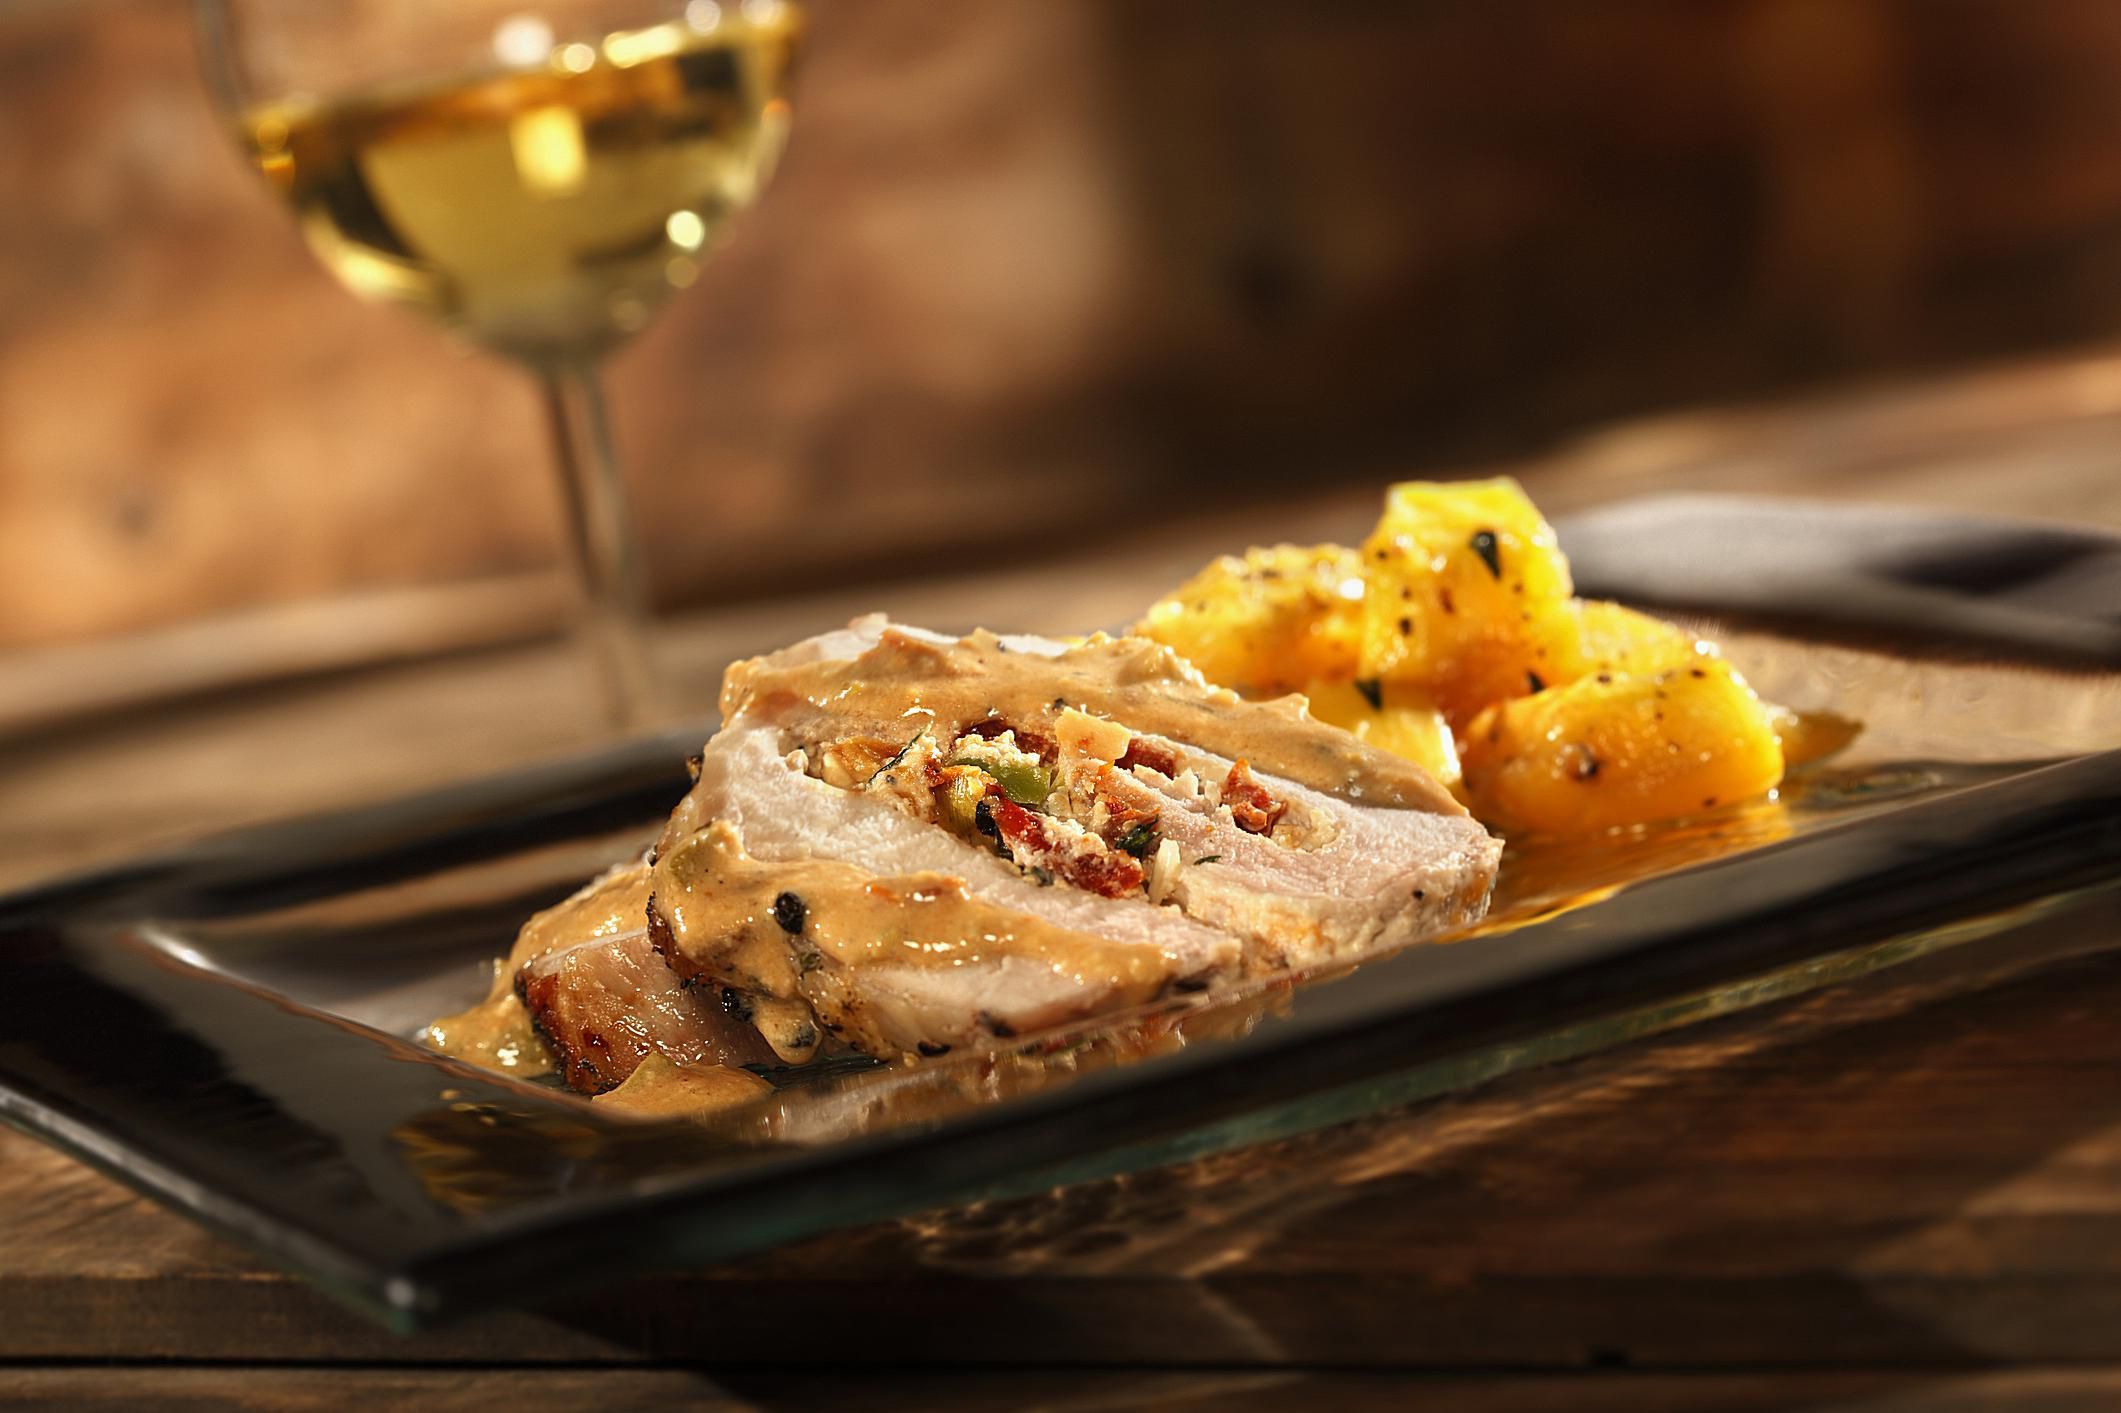 Caribbean Crockpot Pork Is Tender and Very Flavorful